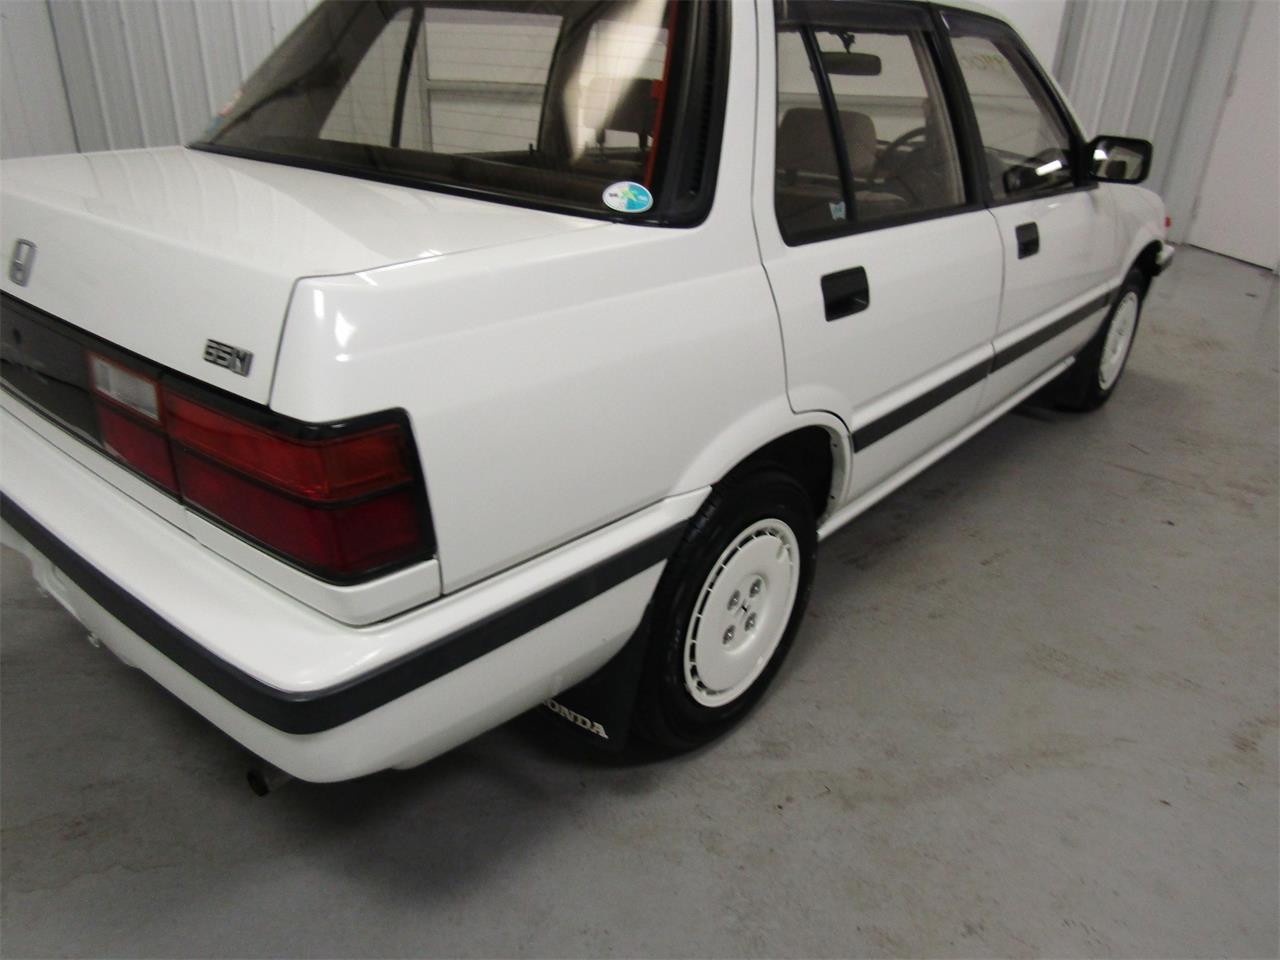 1987 Honda Civic for Sale   ClassicCars.com   CC-1066244